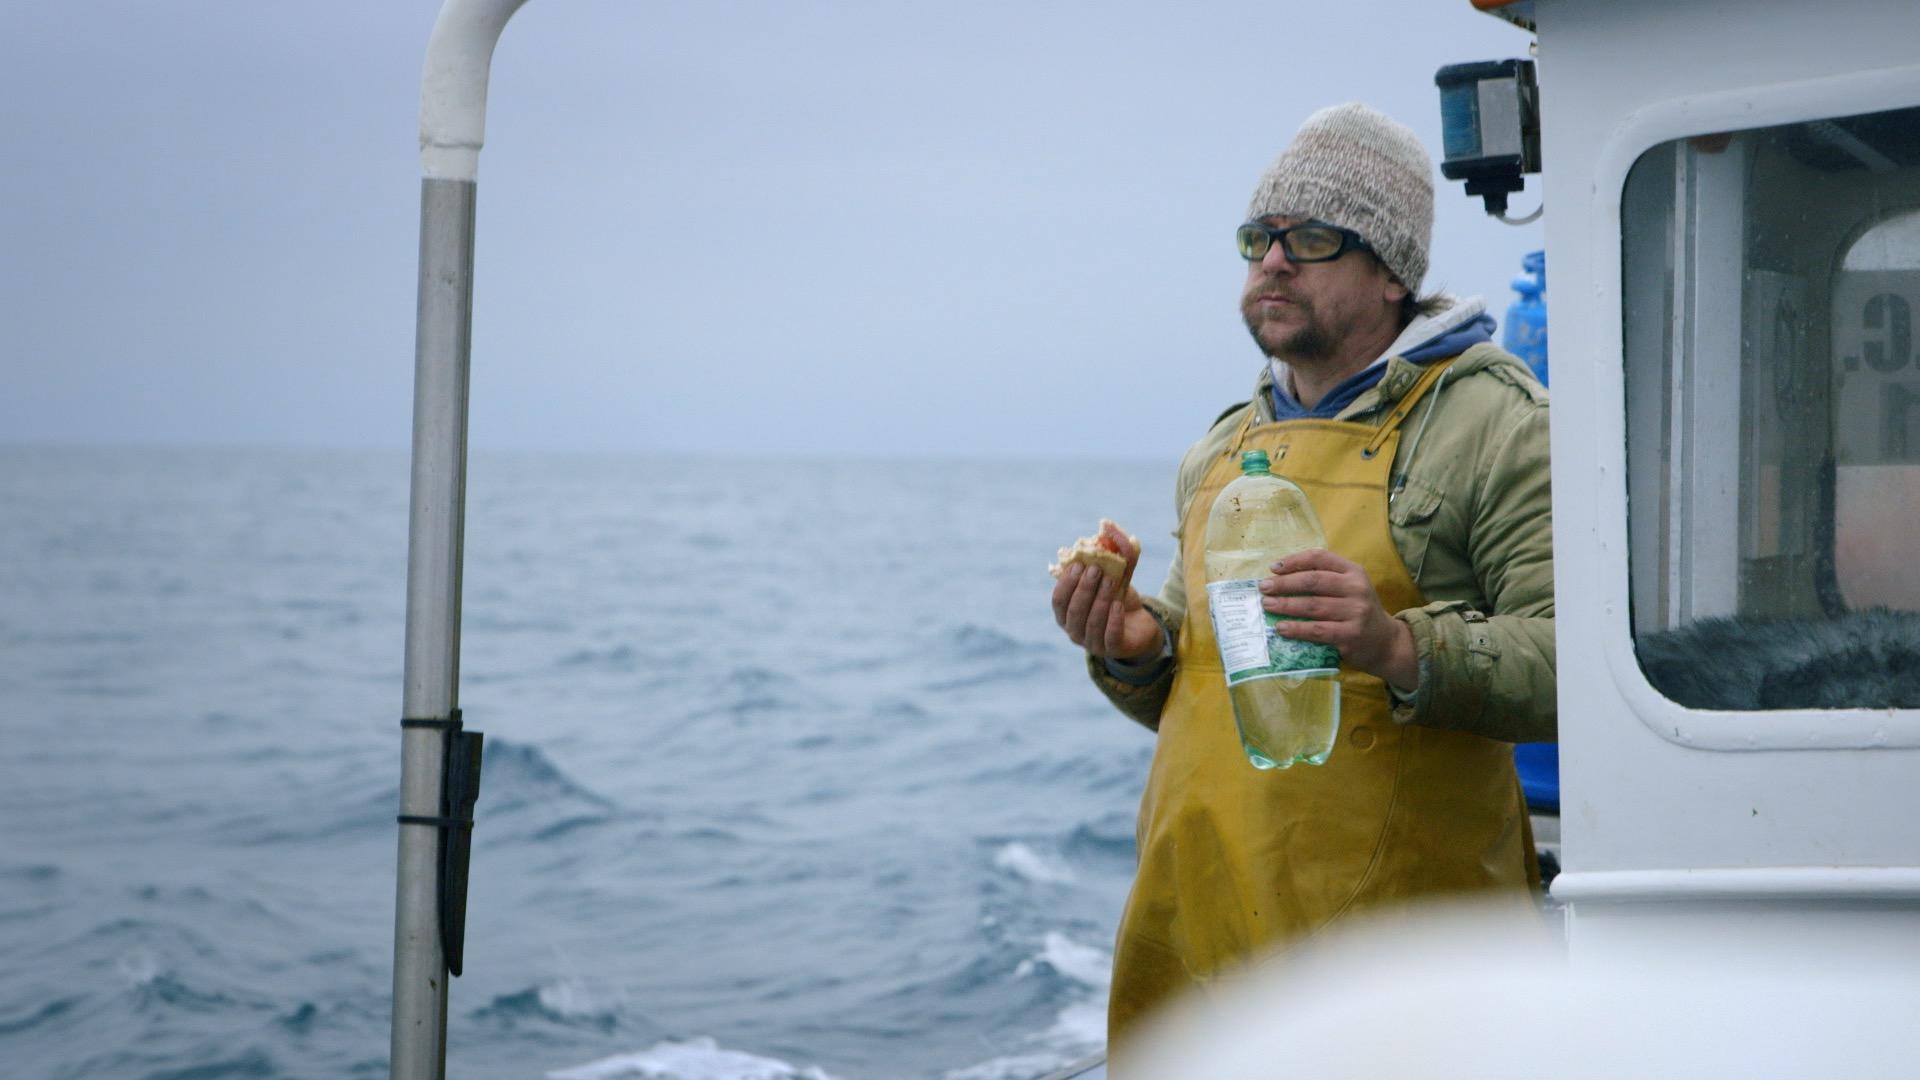 Fisherman_0115_Marker_400.jpg